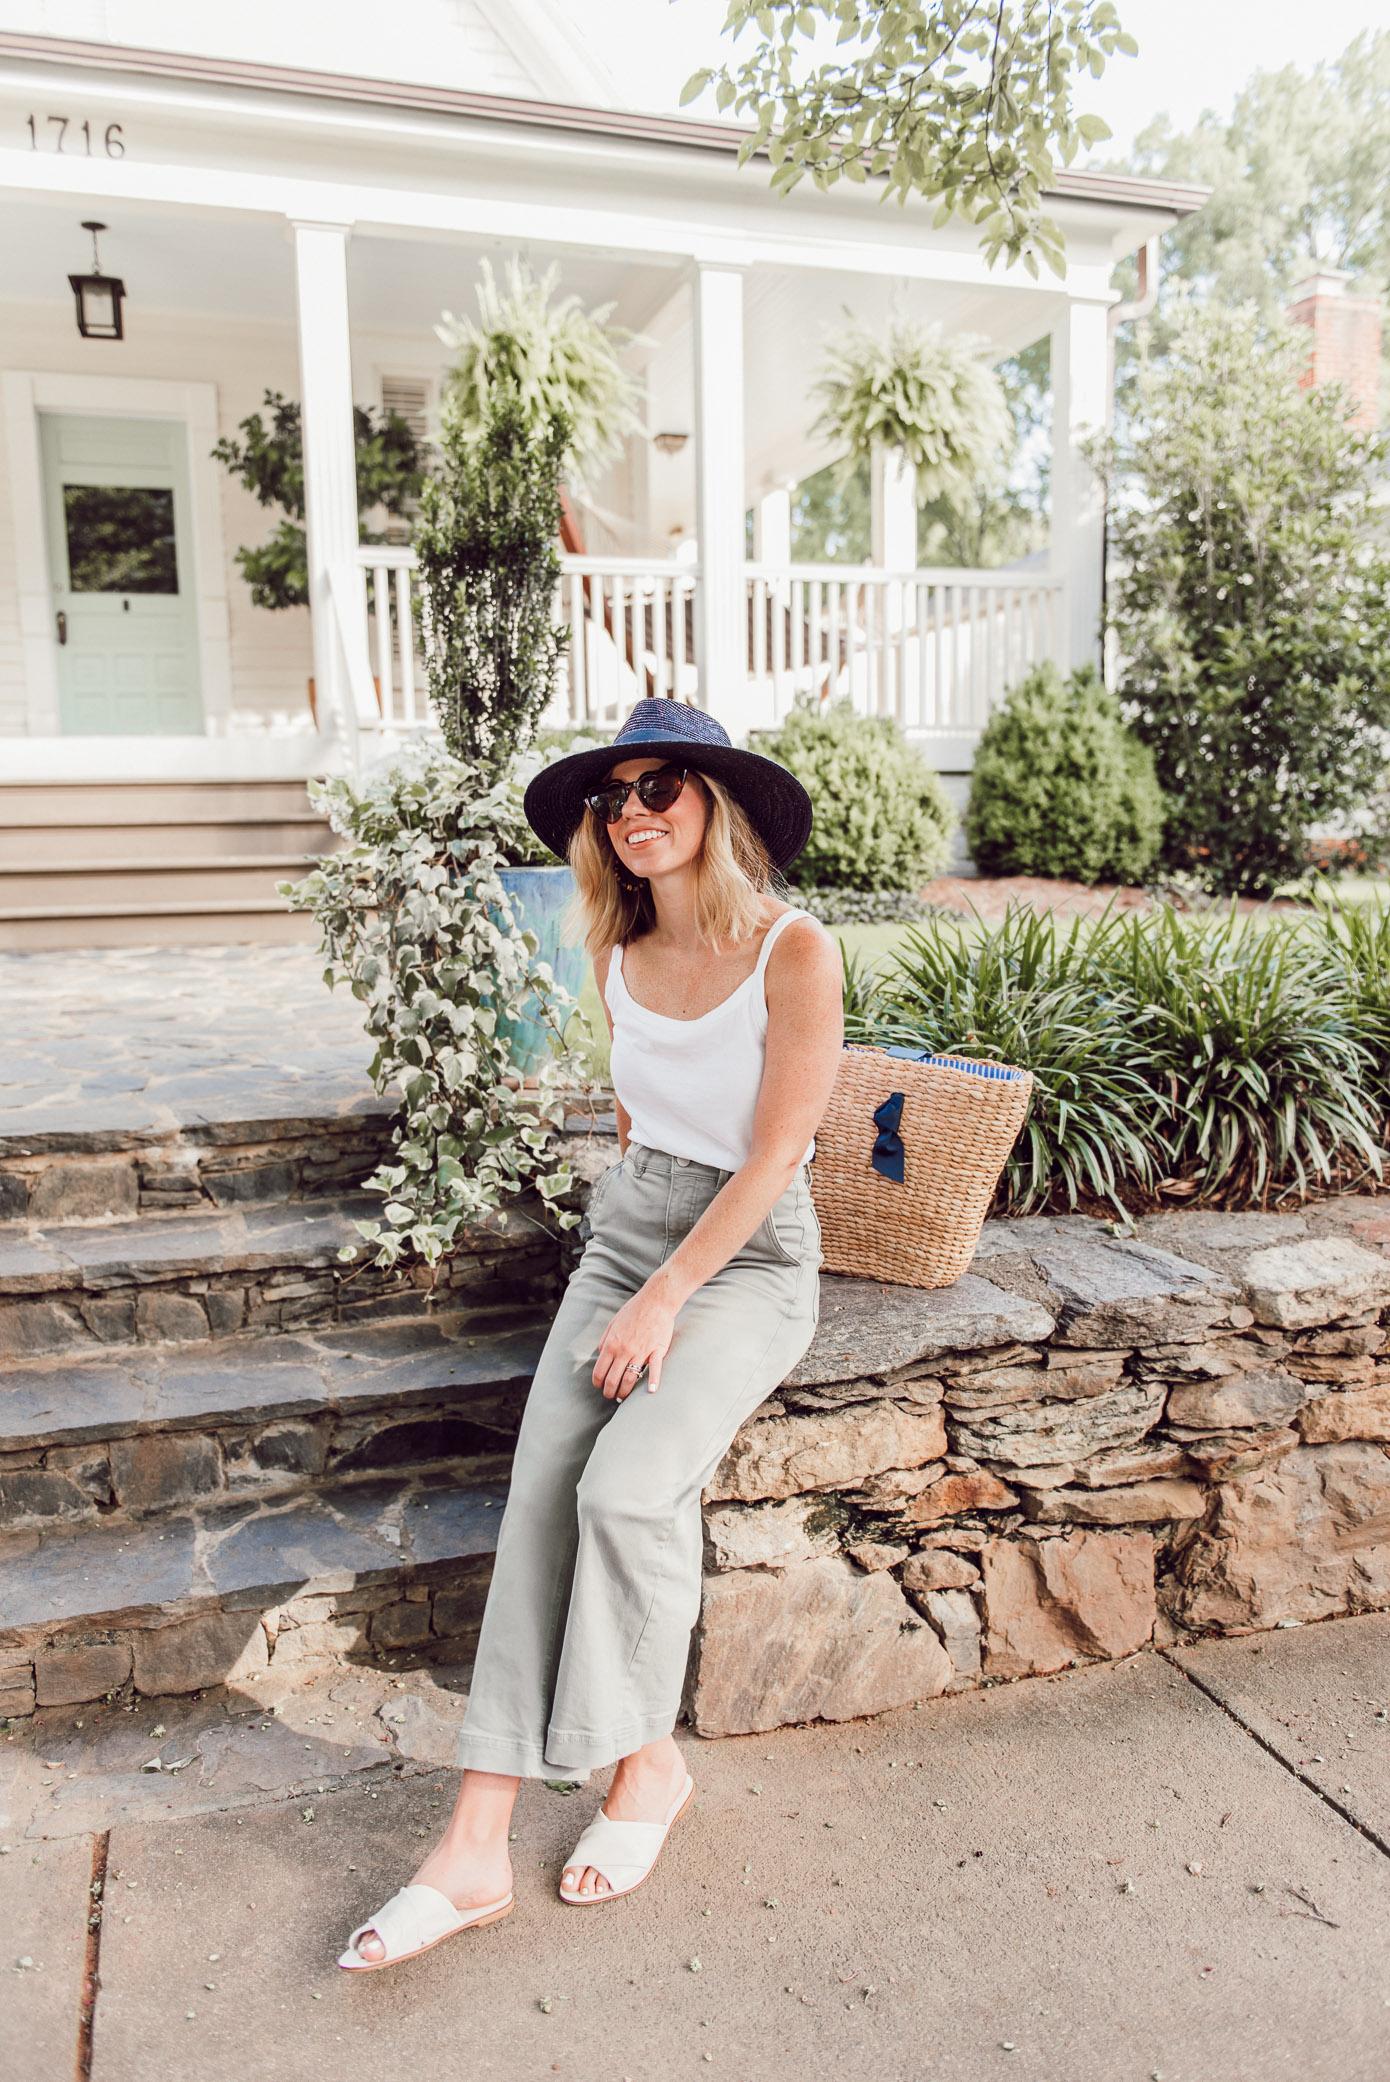 Affordable Summer Basics | Cotton Cami, Wide Leg Crop Pants | Ft. Everlane, Joules, Brixton | Louella Reese